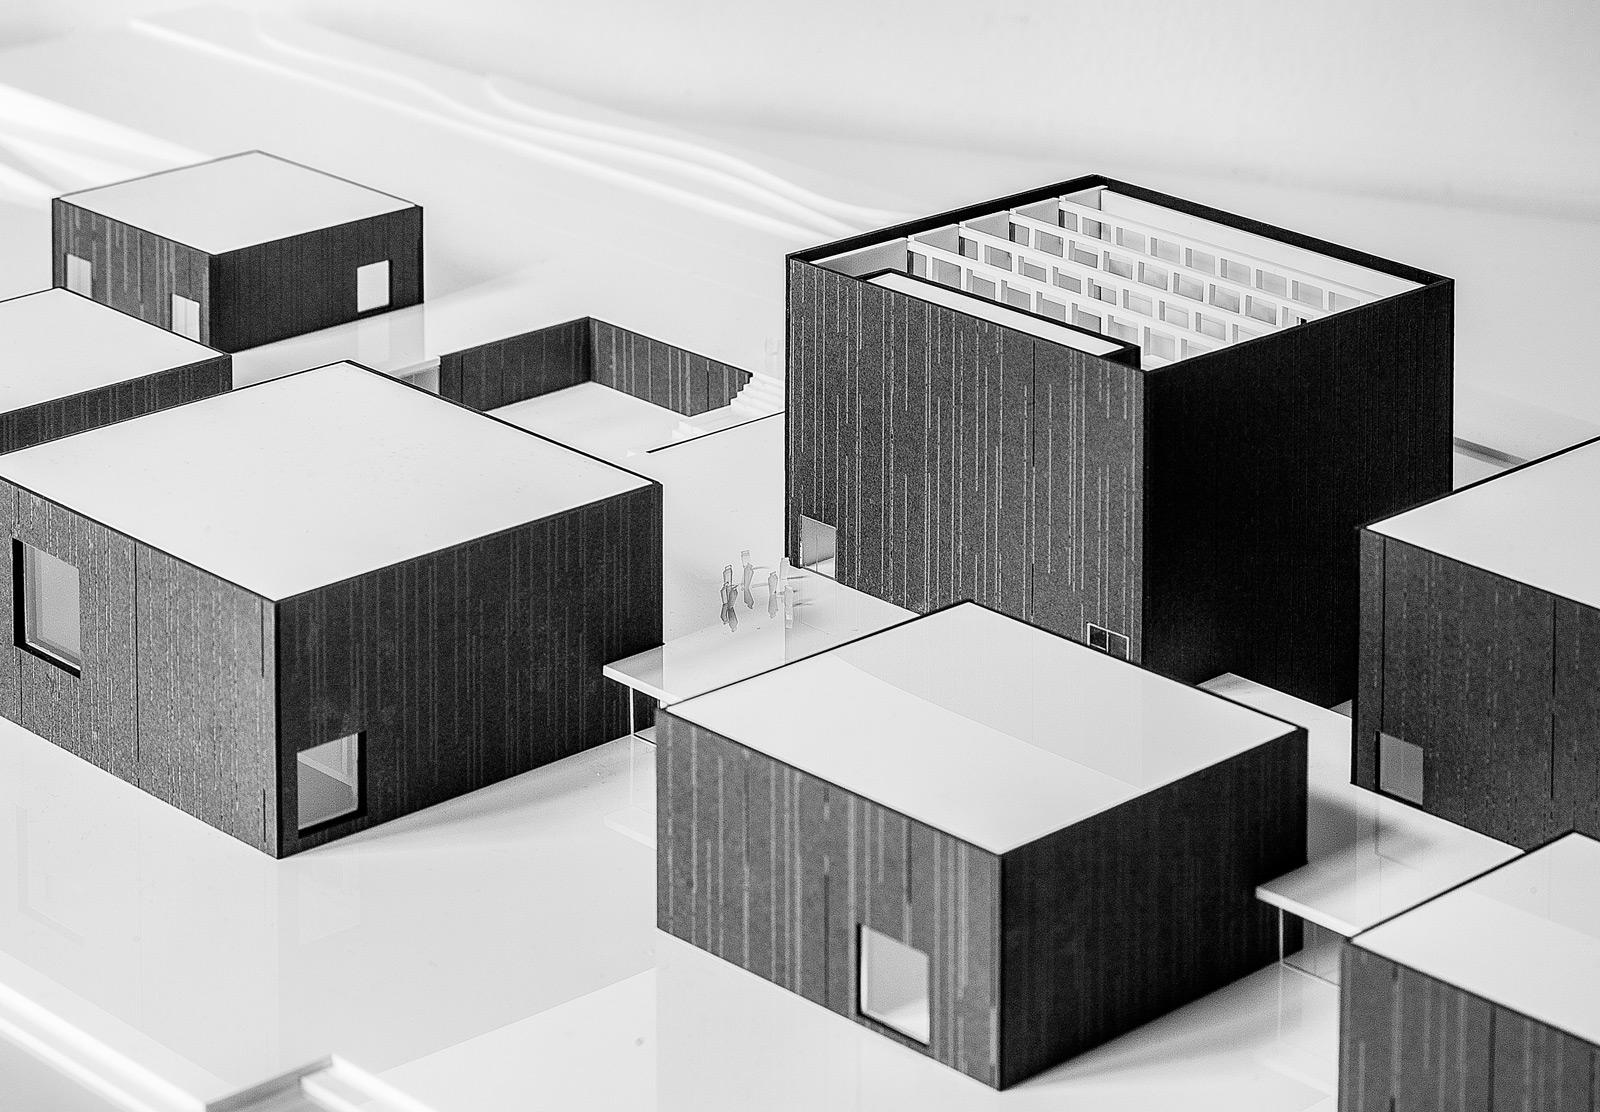 maqueta-arquitectura-valencia-arquiayuda-arquimaqueta-museo-fluvial-en-oporto-architecture-model (4)